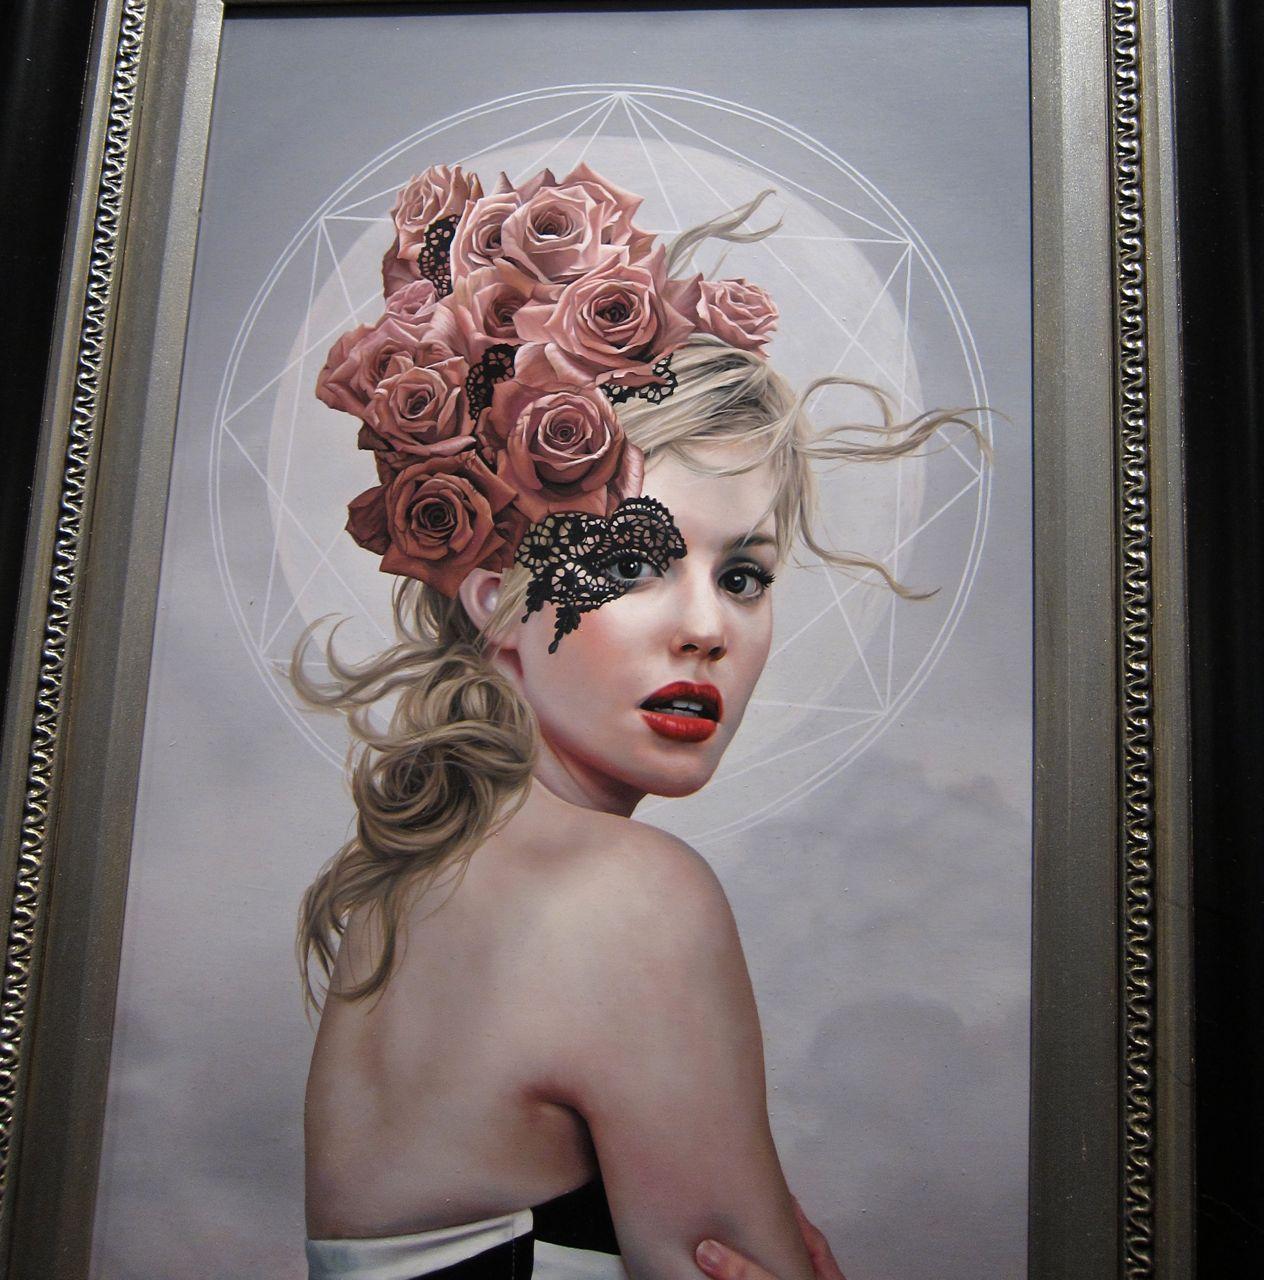 Scope Miami Corey Helford Gallery AM 07